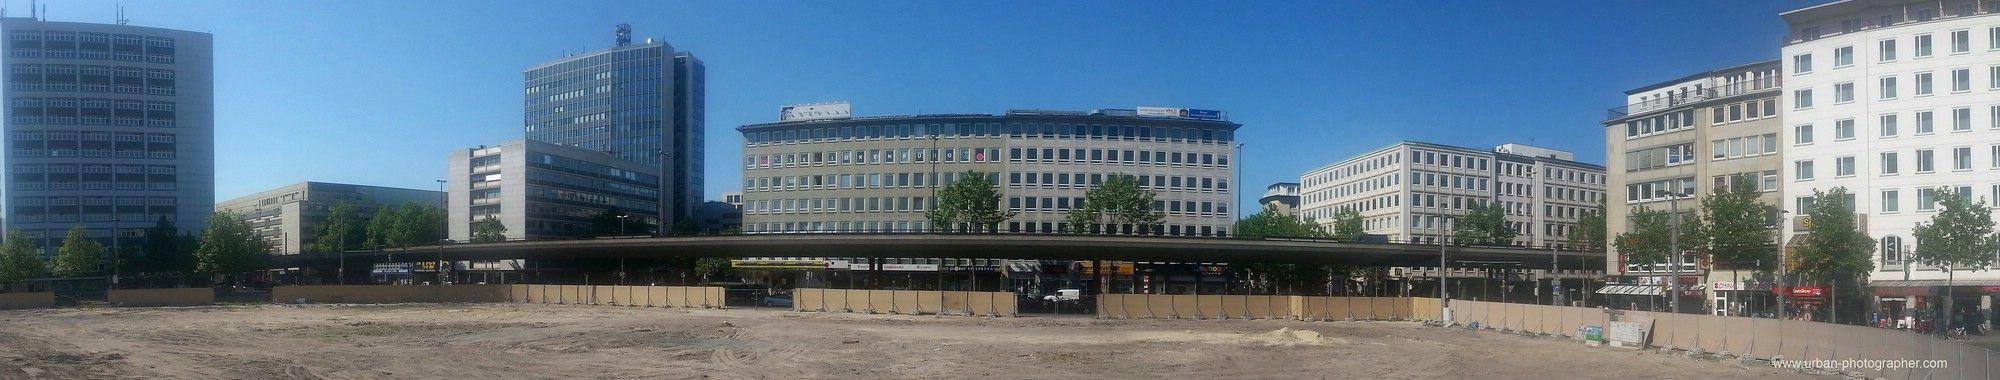 Baustelle Bahnhofsplatz 4